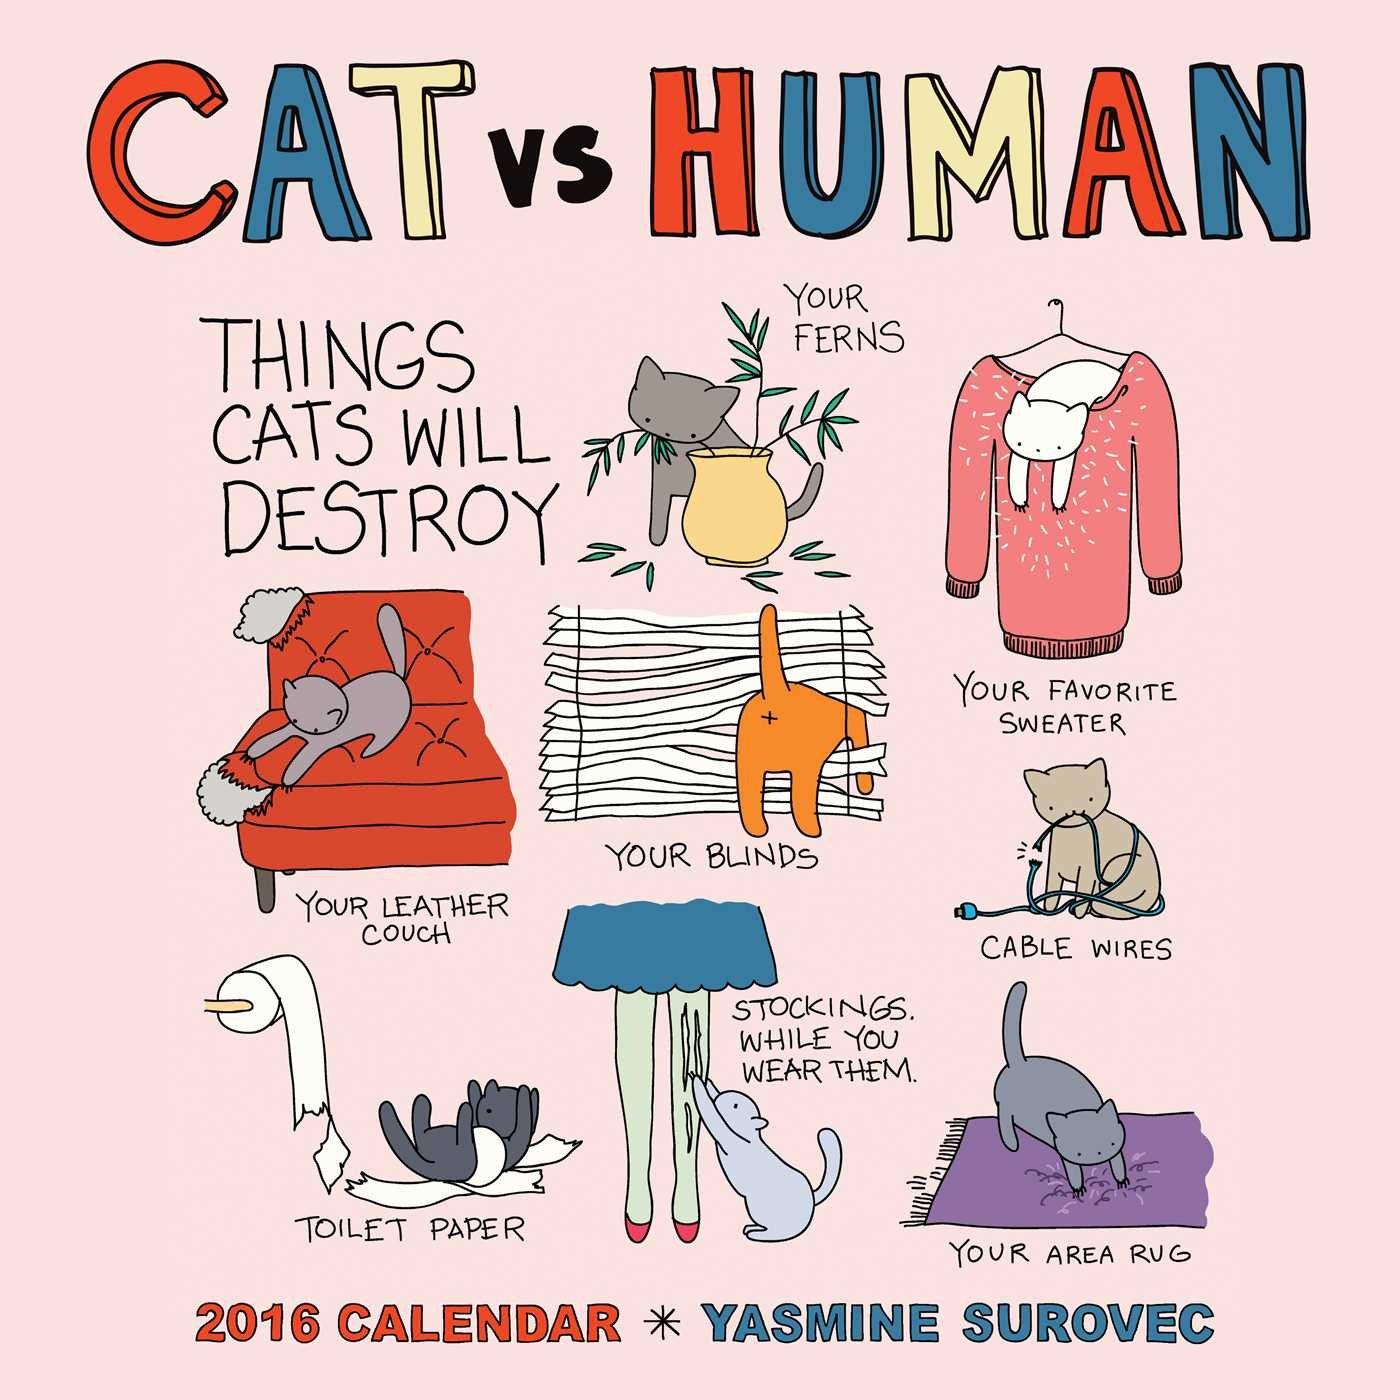 CAT HUMAN 2016 Wall Calendar product image